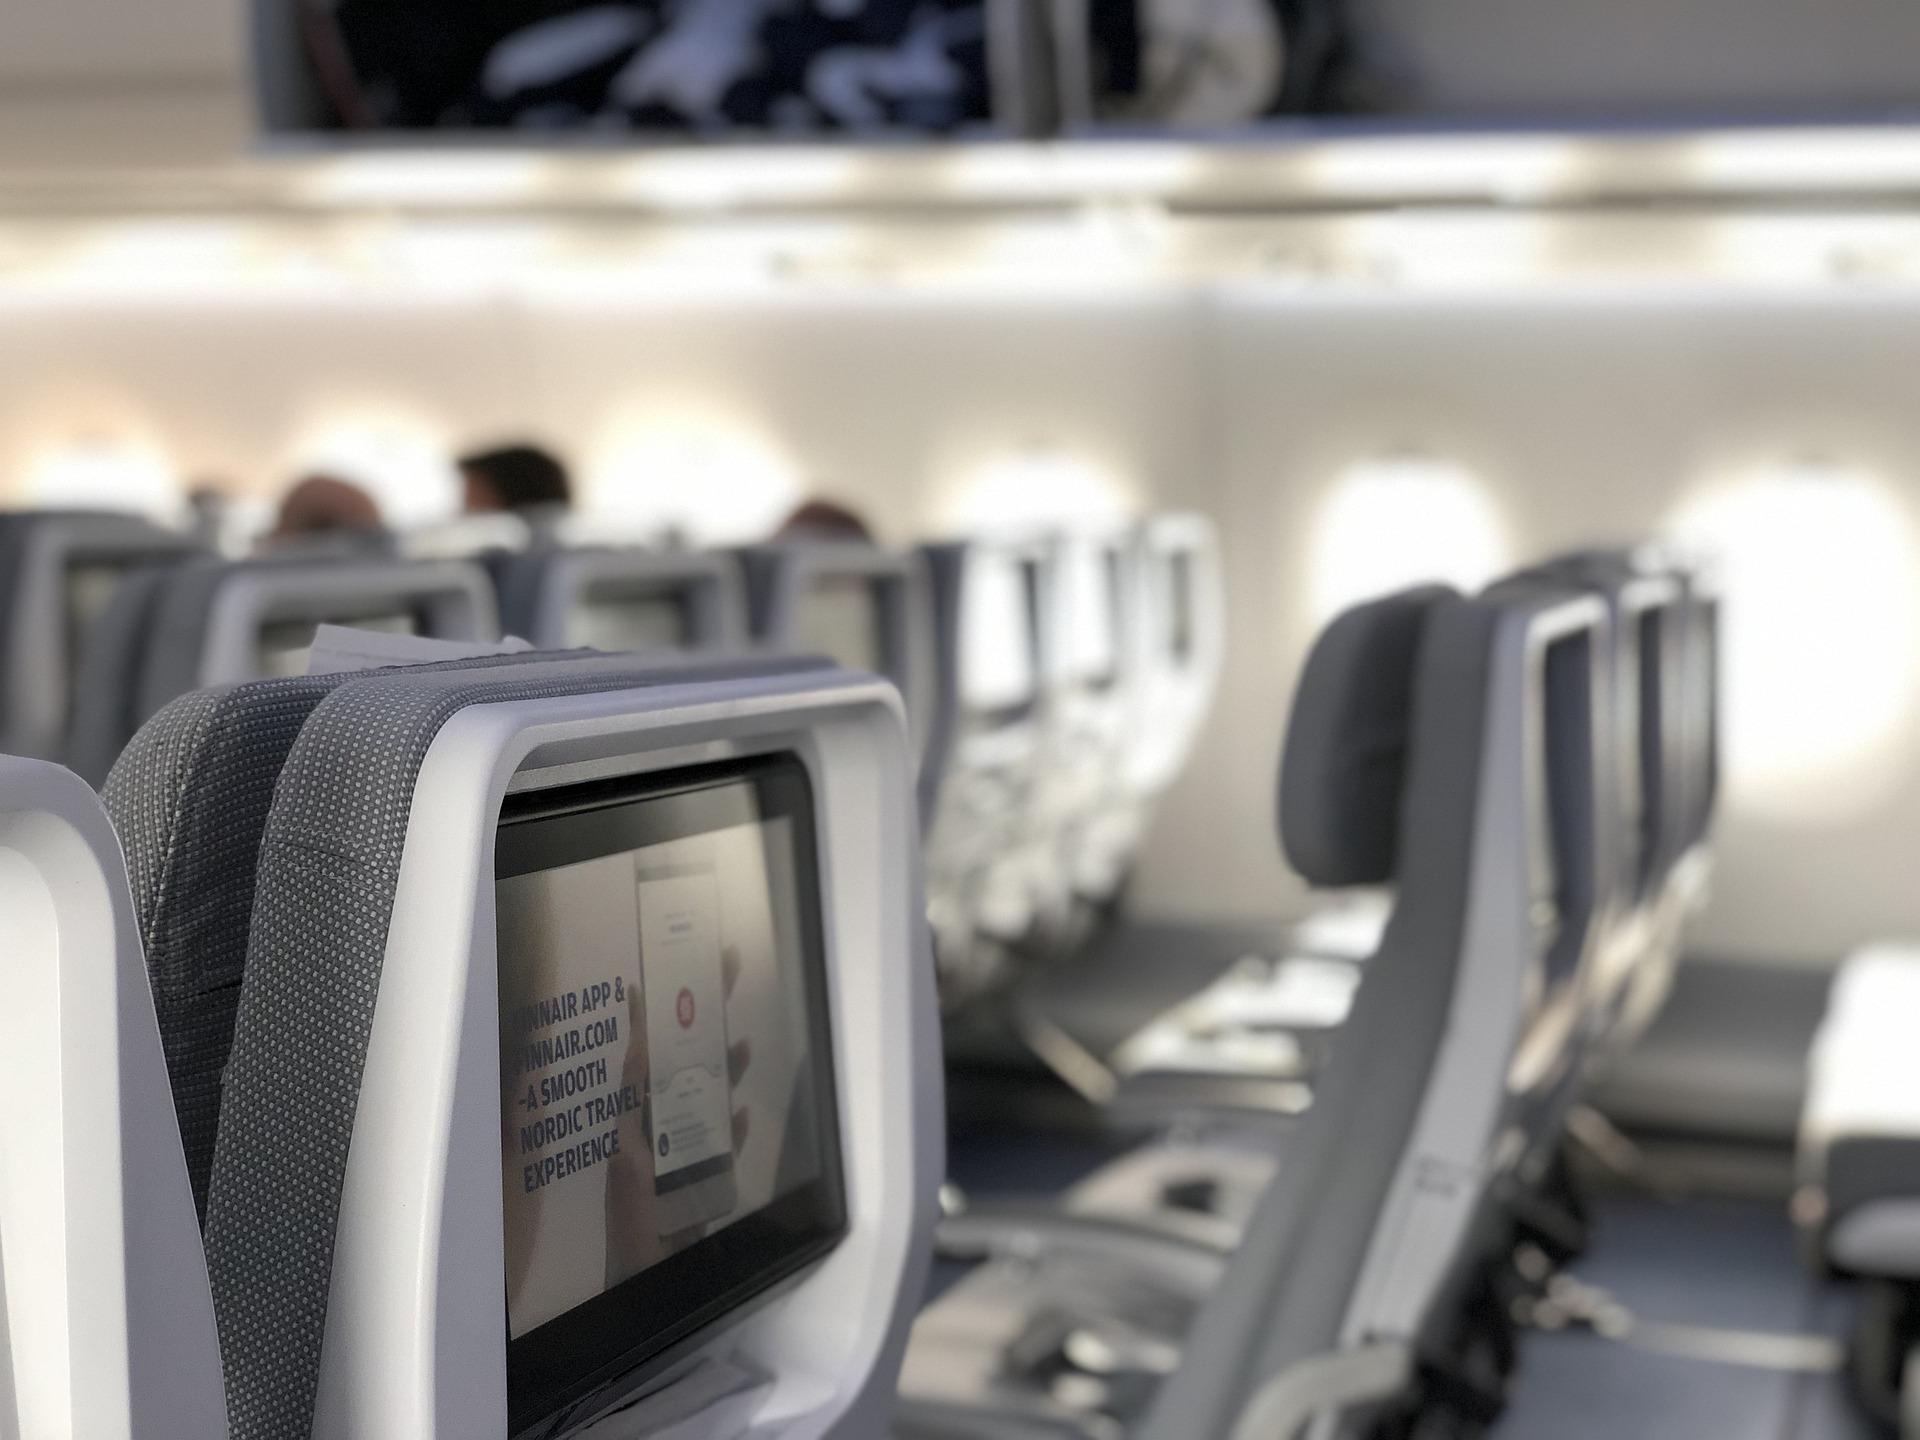 Flugzeug Kabinen werden wohl umgebaut